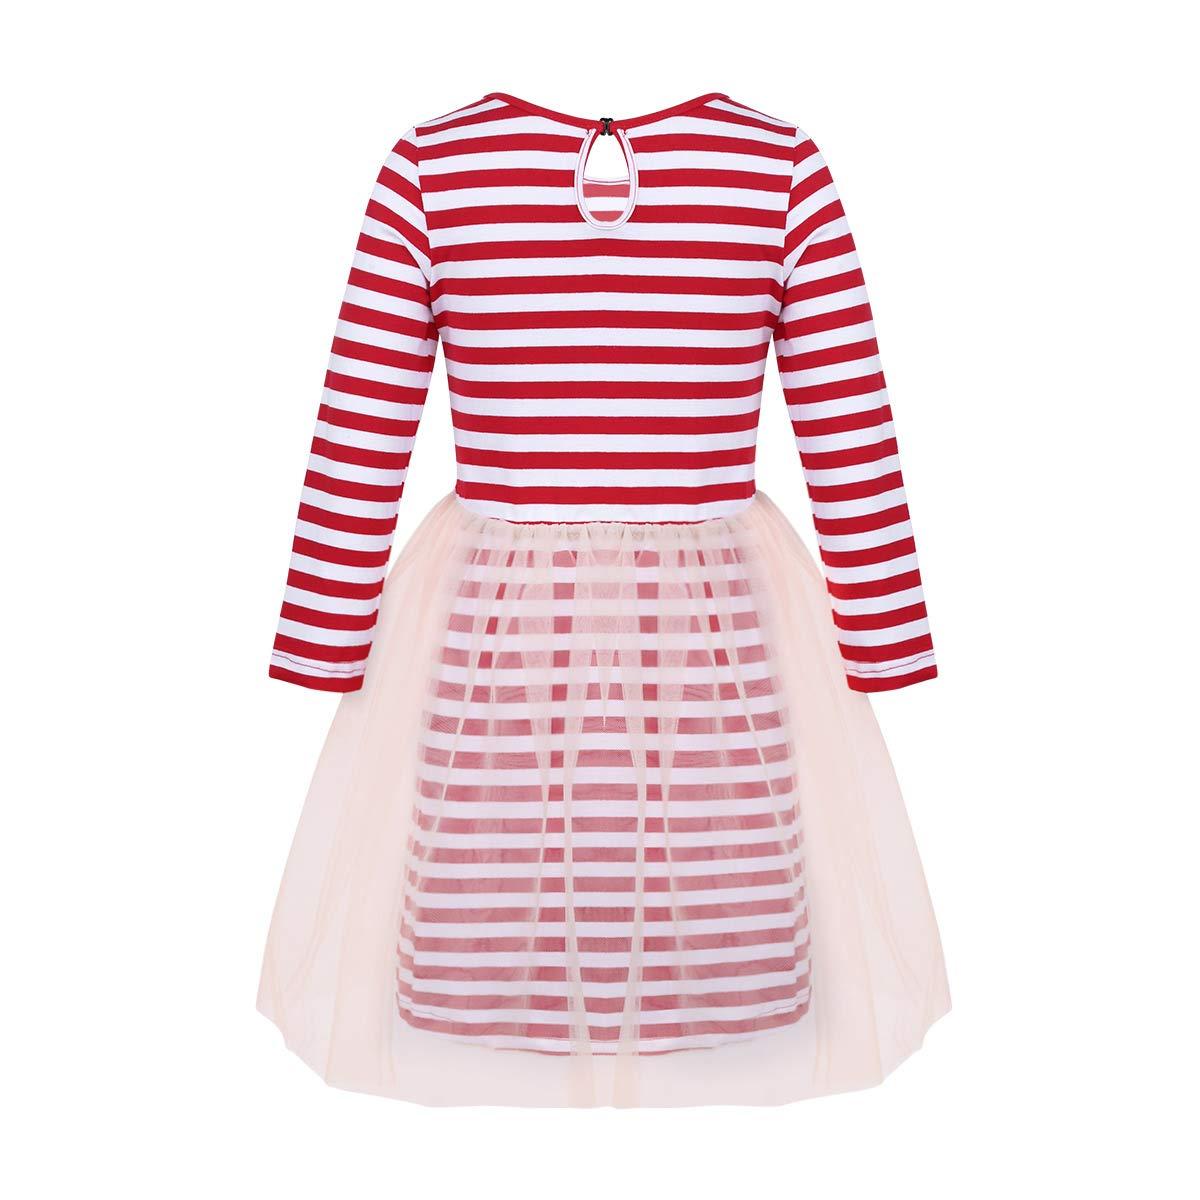 ACSUSS Infant Toddler Girls Christmas Dress Sequins Collar Stripe Long Sleeves Tutu Dress T-Shirt